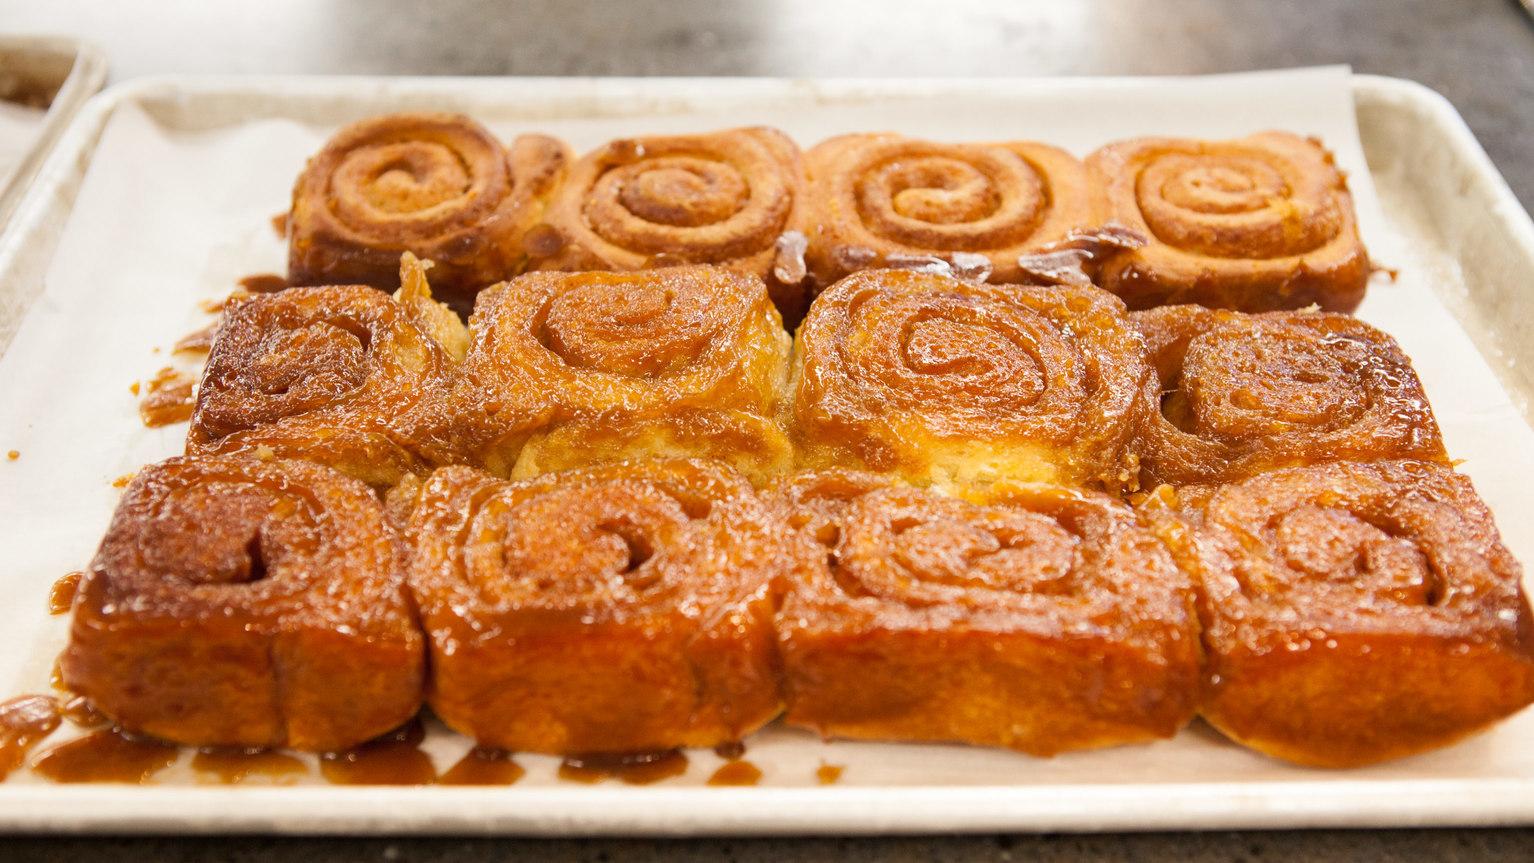 Delicious caramel rolls